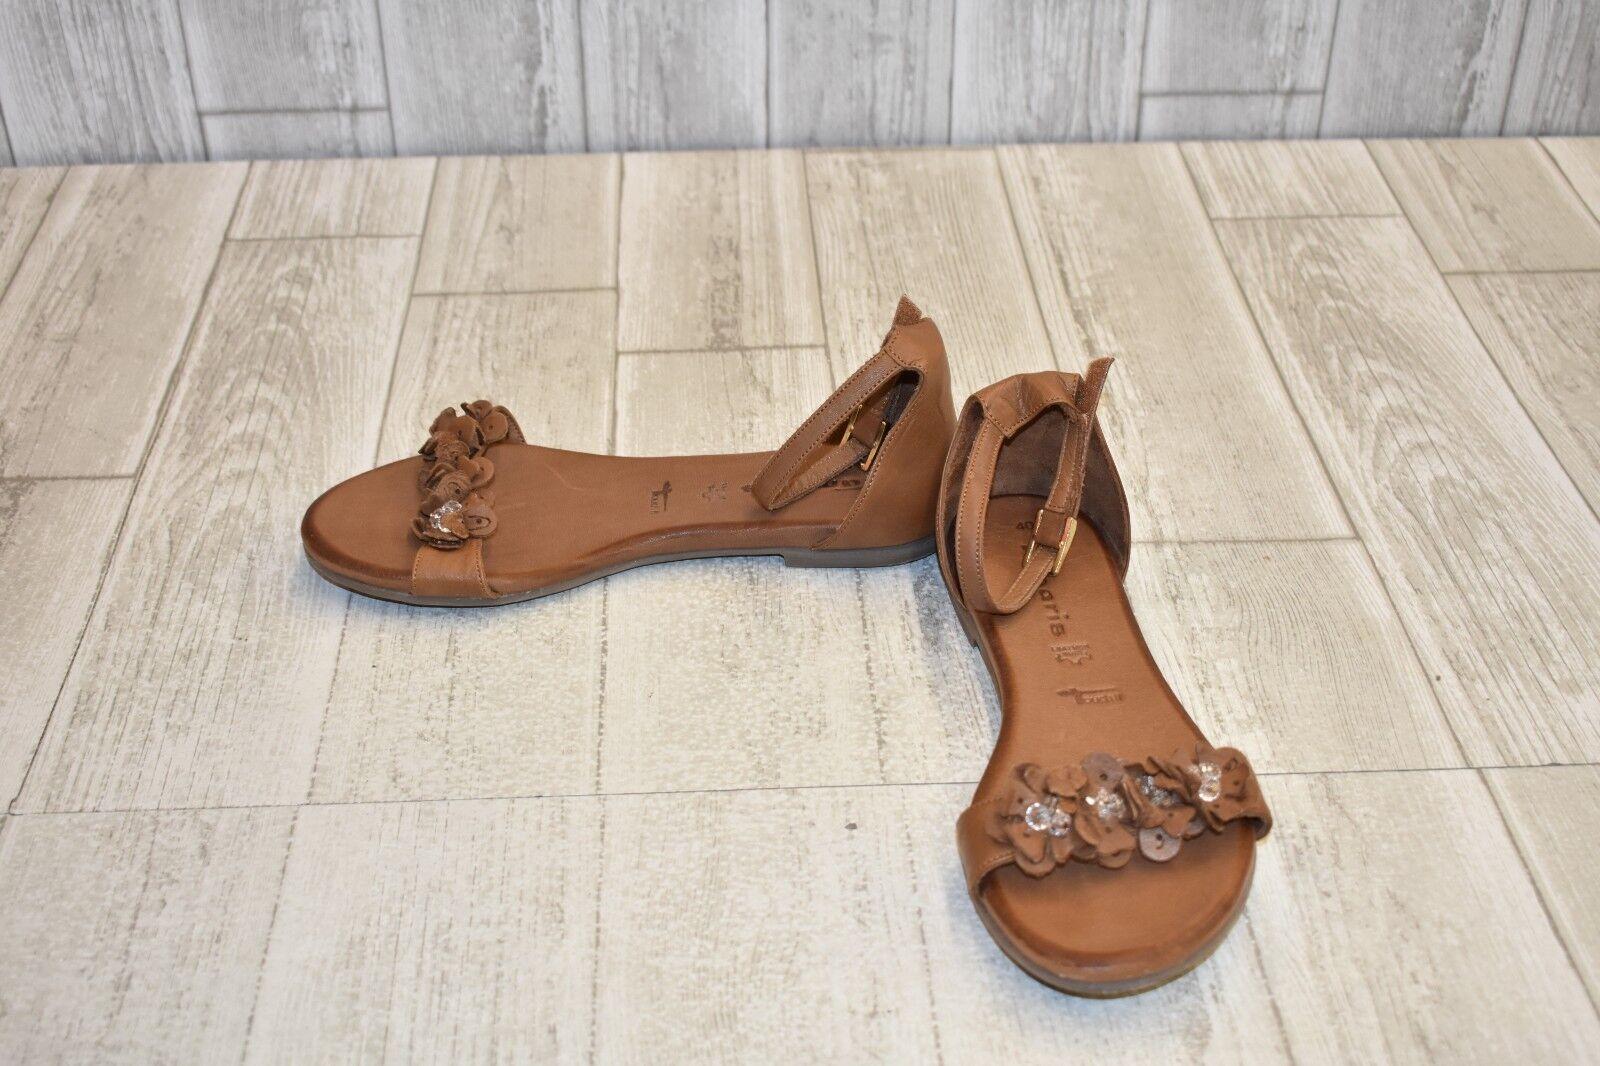 ac8fc00cfc5f7 Tamaris Flat - Women's Size 8.5 Brown Sandal ndzgxi4367-Women's ...